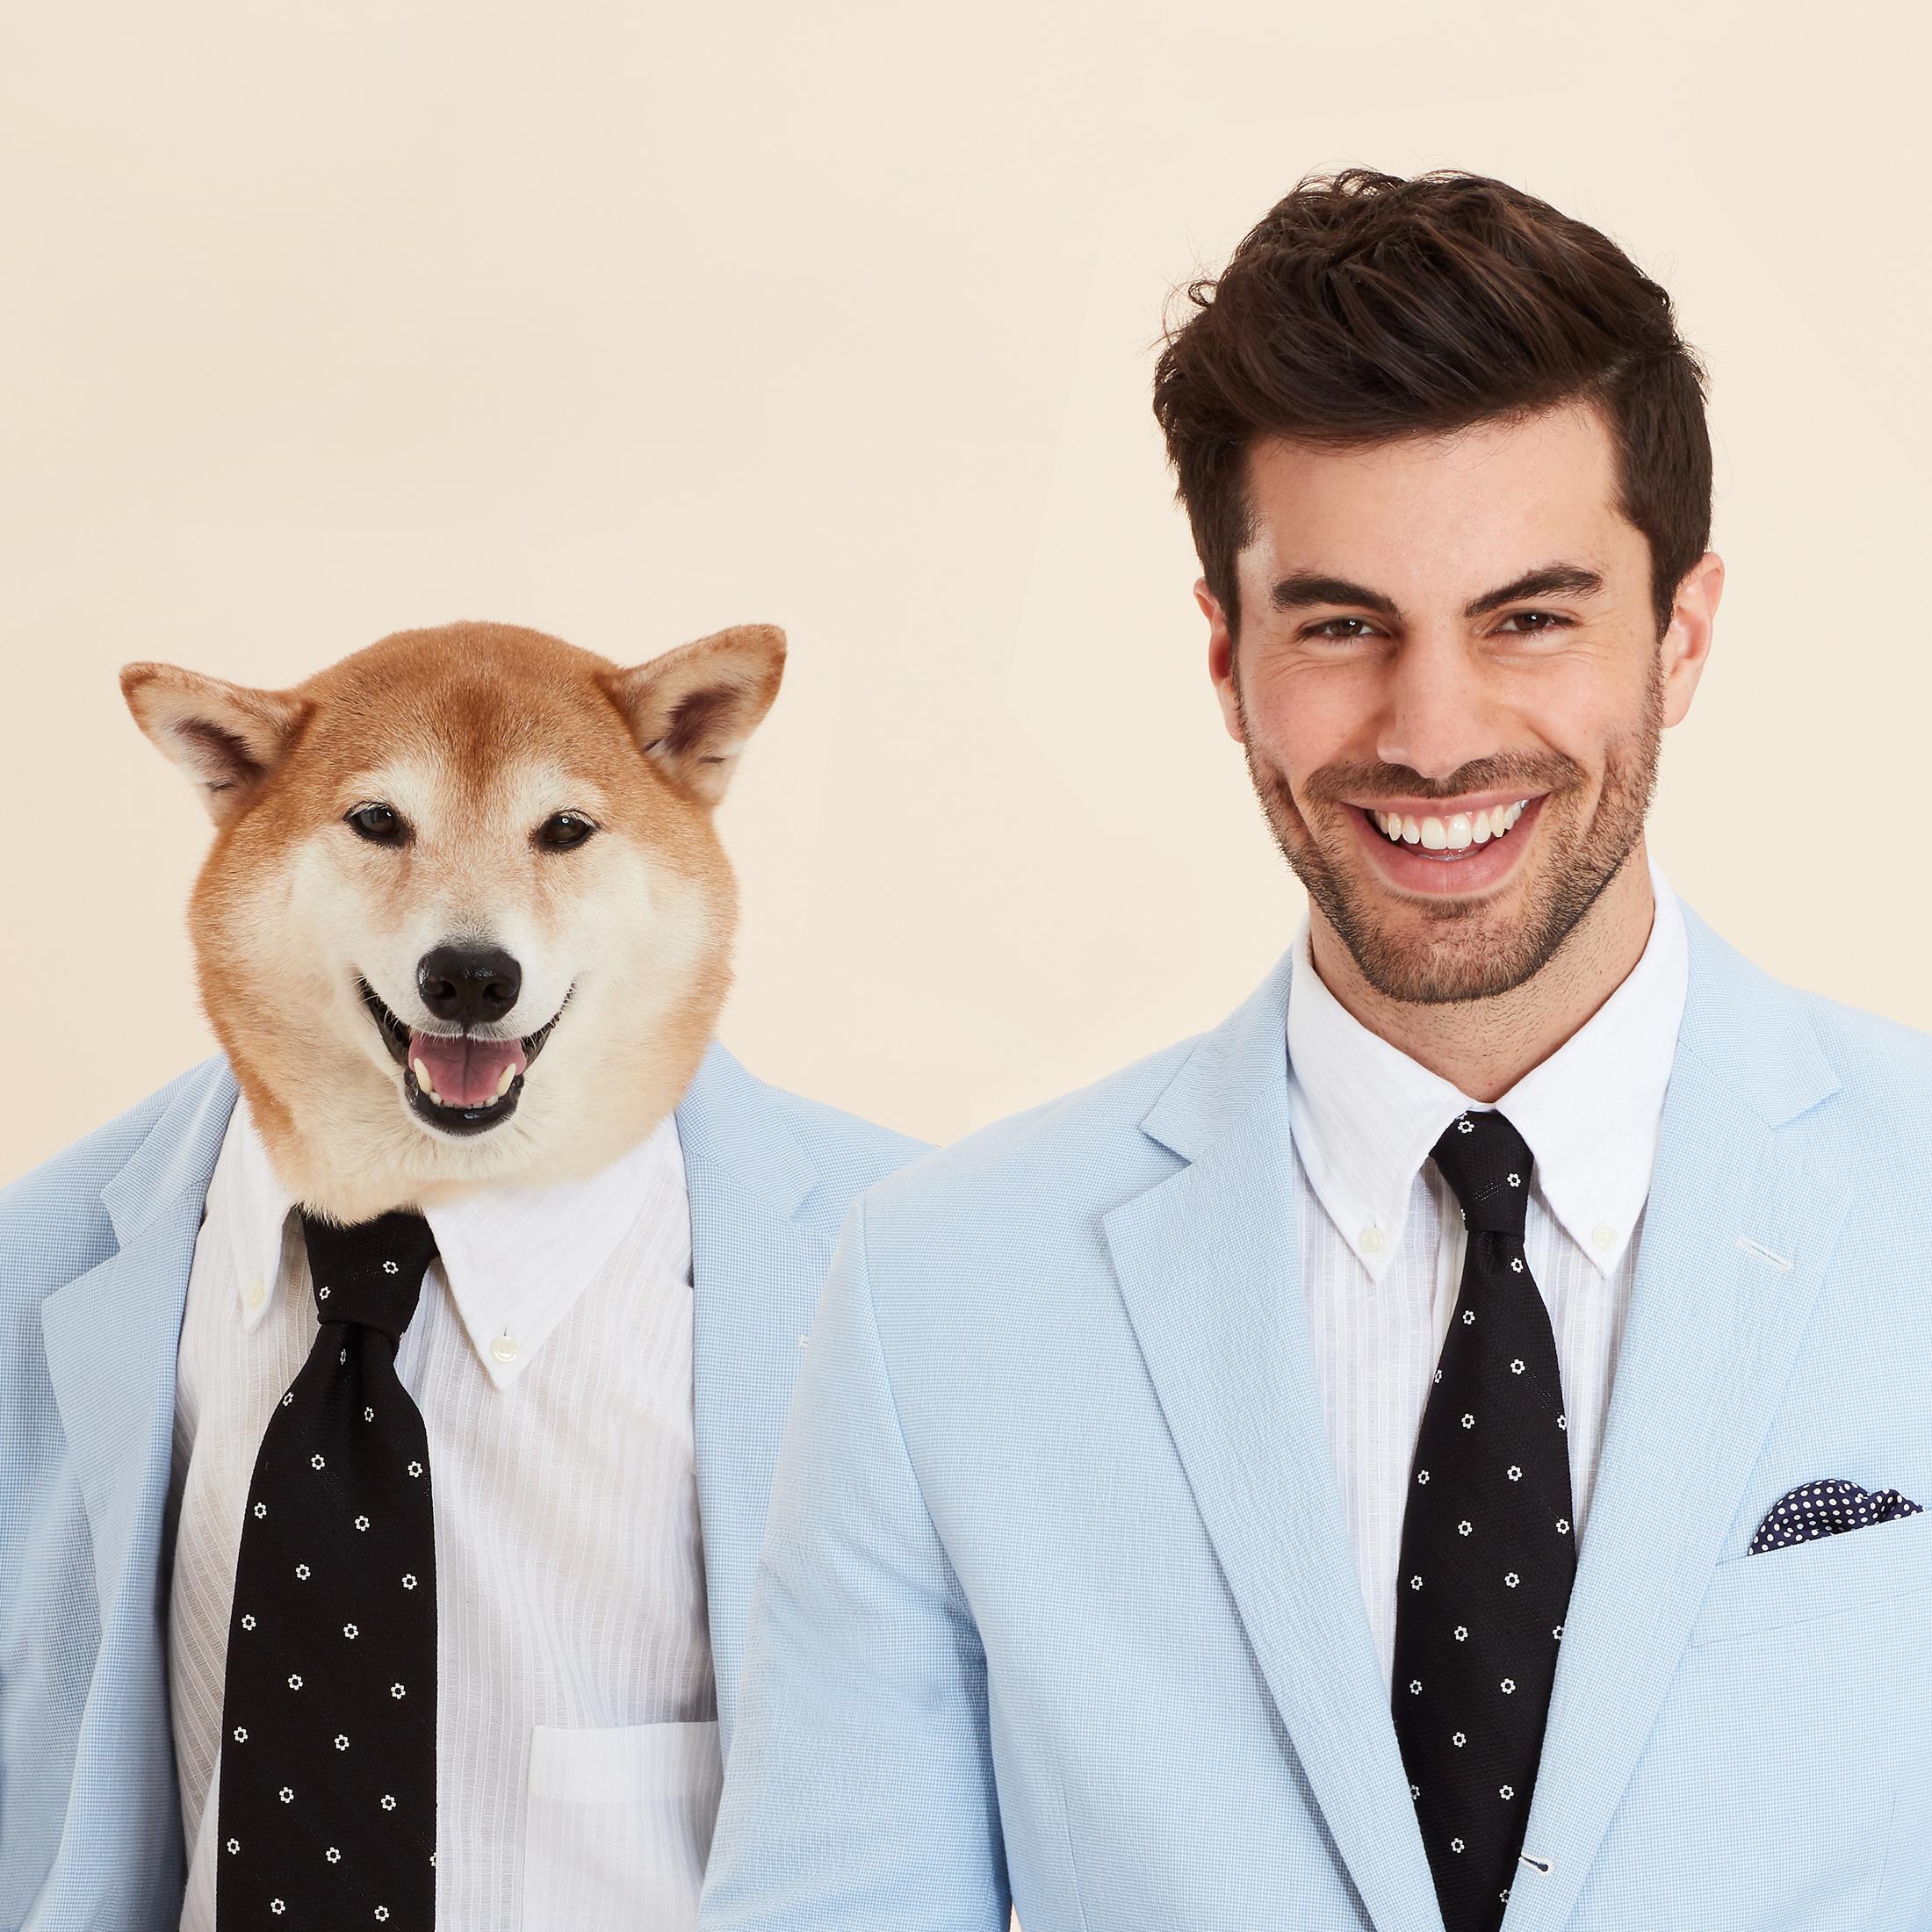 MAY19_ML)MENSWEAR_DOG_SHOT3_Wedding